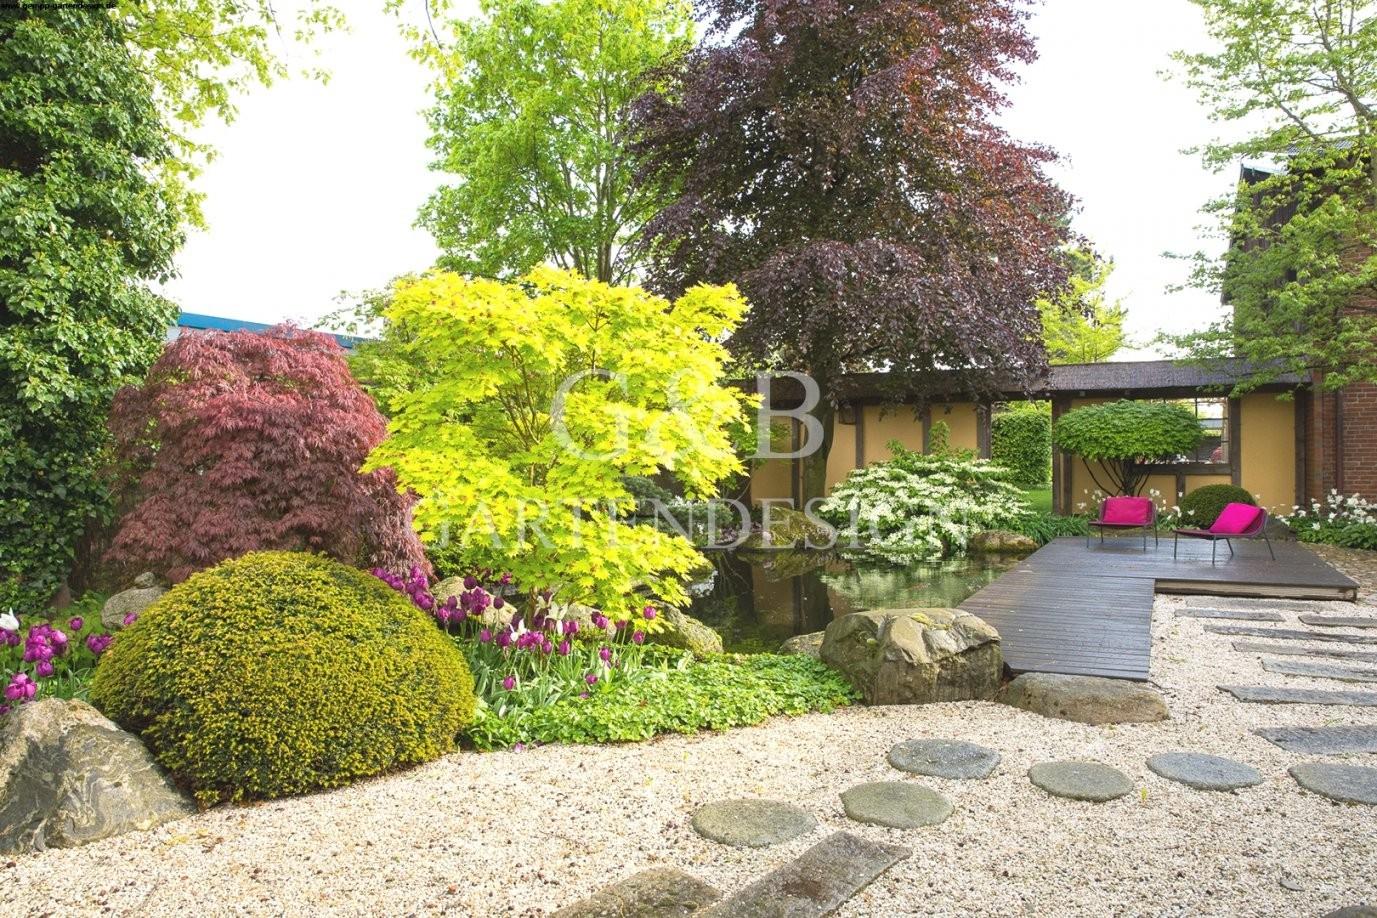 Pflanzen Japanischer Garten Anlegen  Haus Ideen von Japanischer Garten Selbst Anlegen Photo